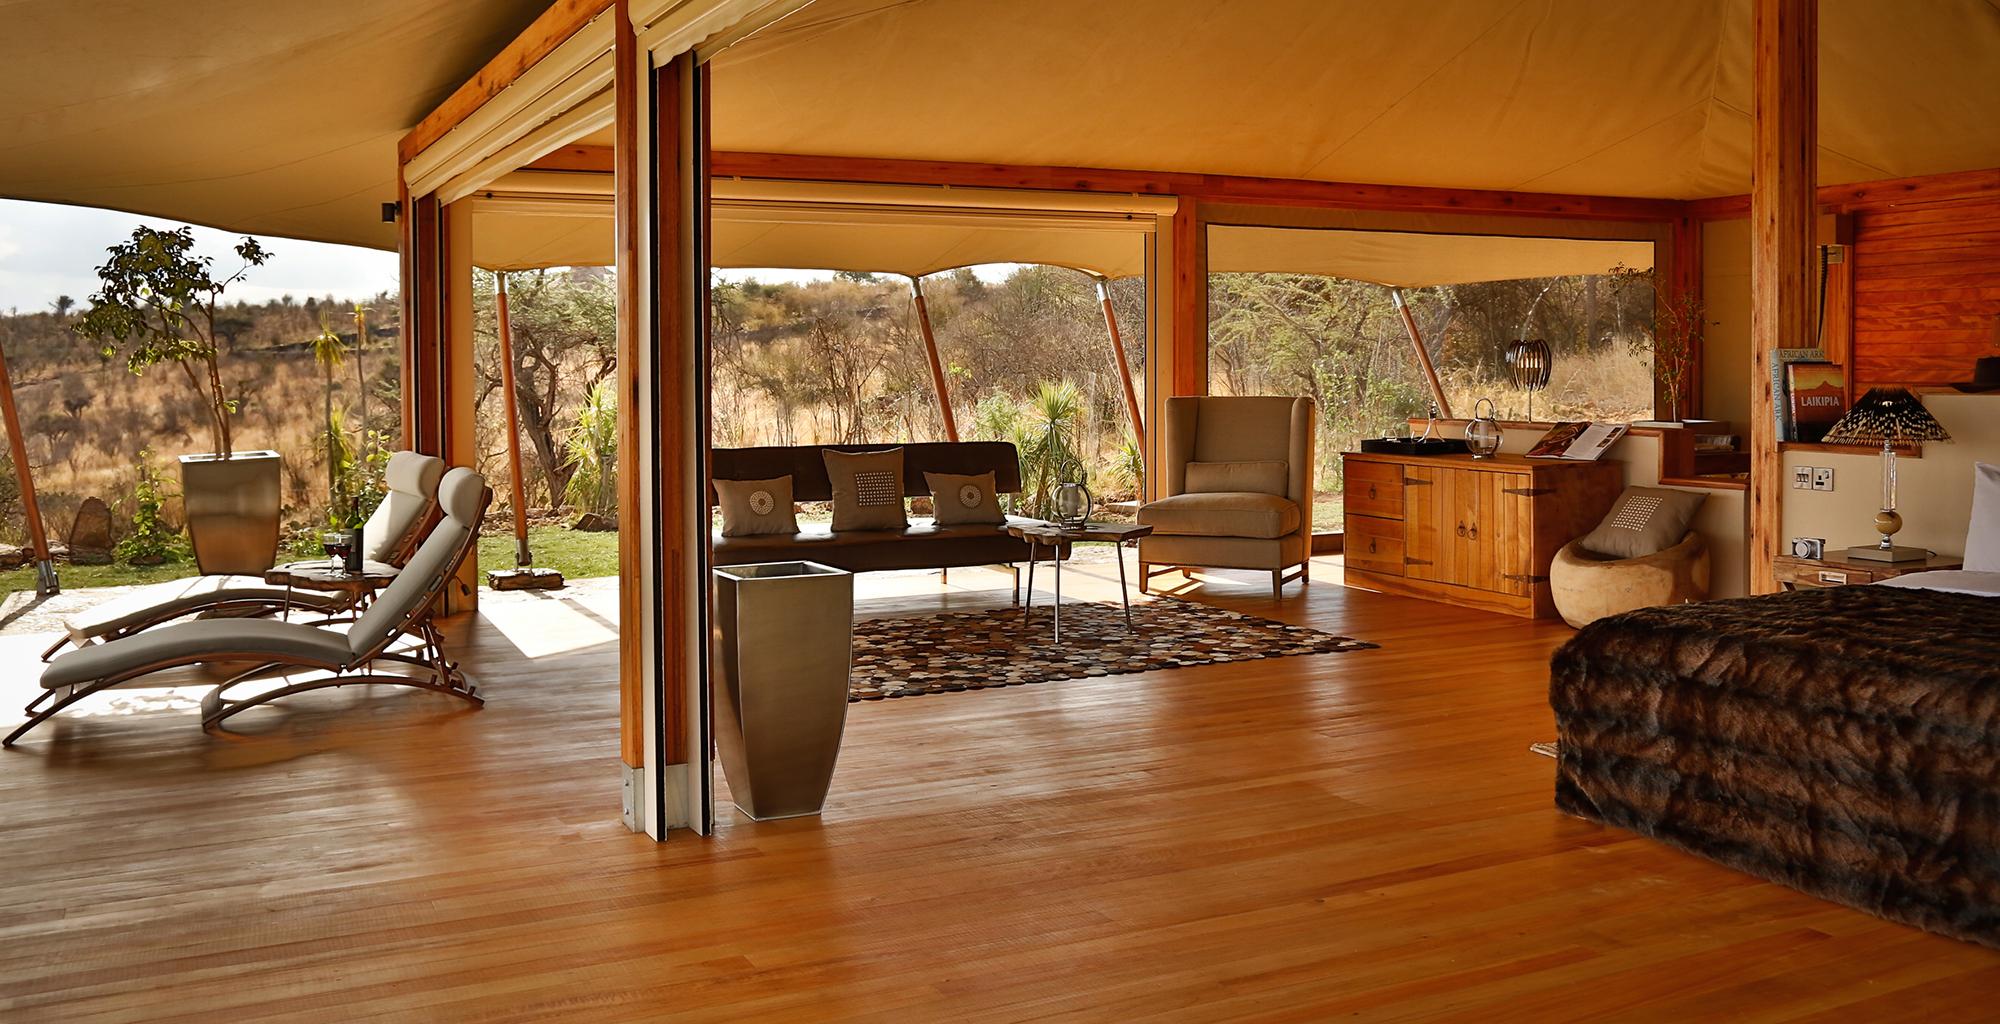 Kenya-Loisaba-Tented-Camp-Bedroom